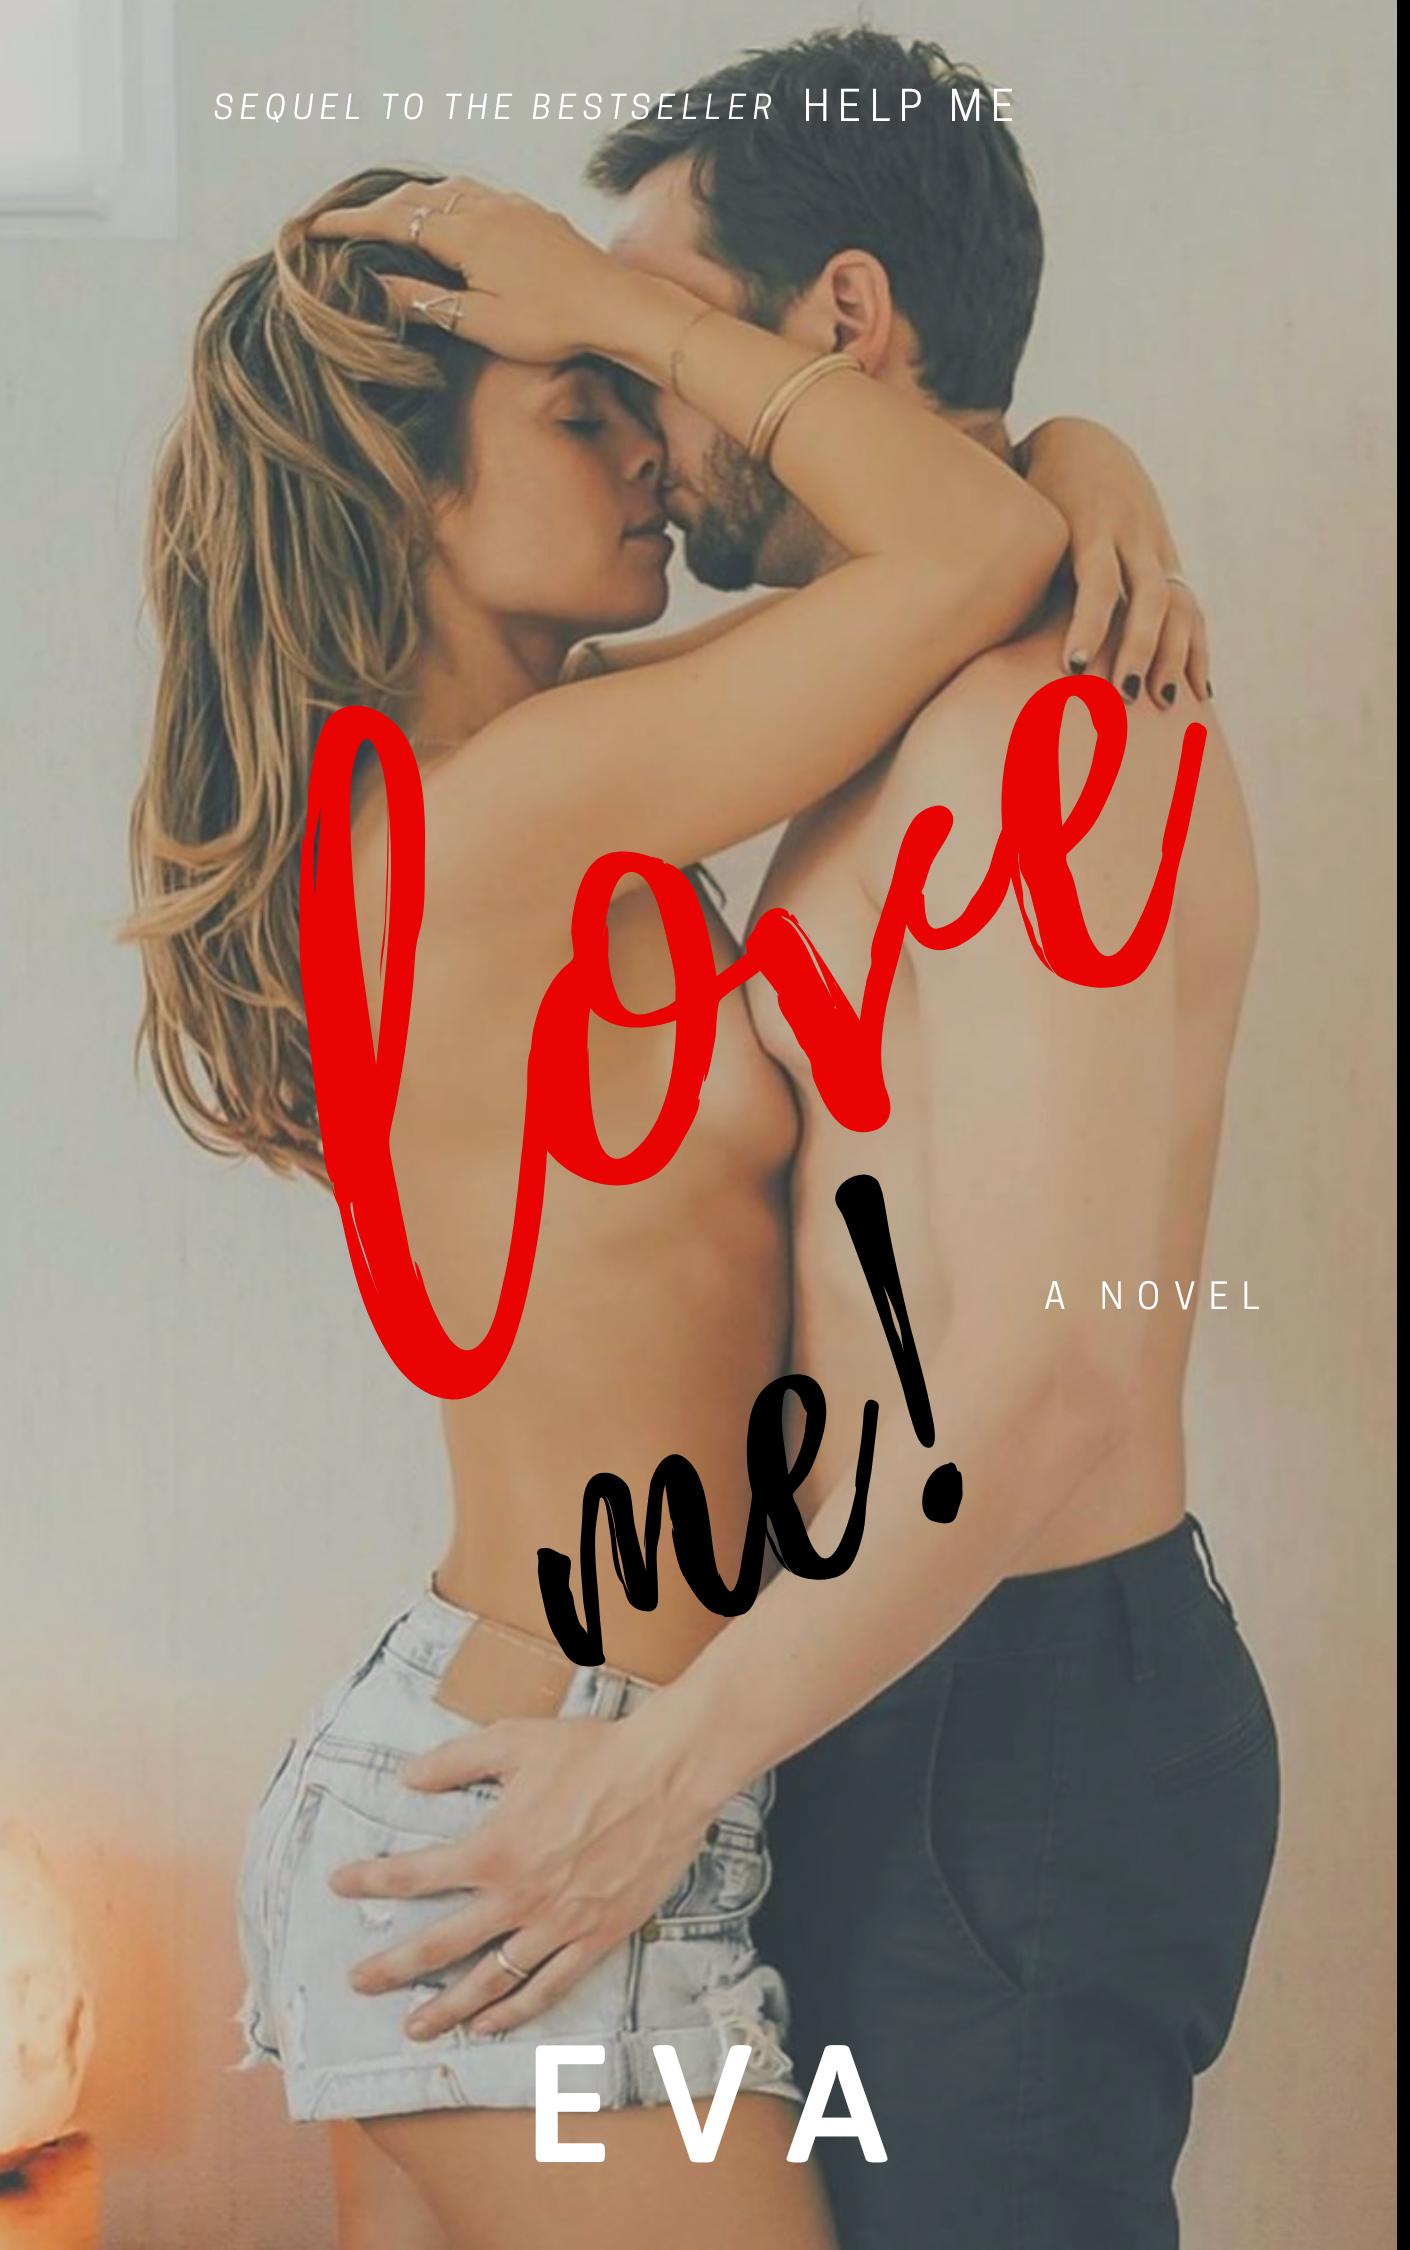 LOVE ME 21++ (Sequel HELP ME)